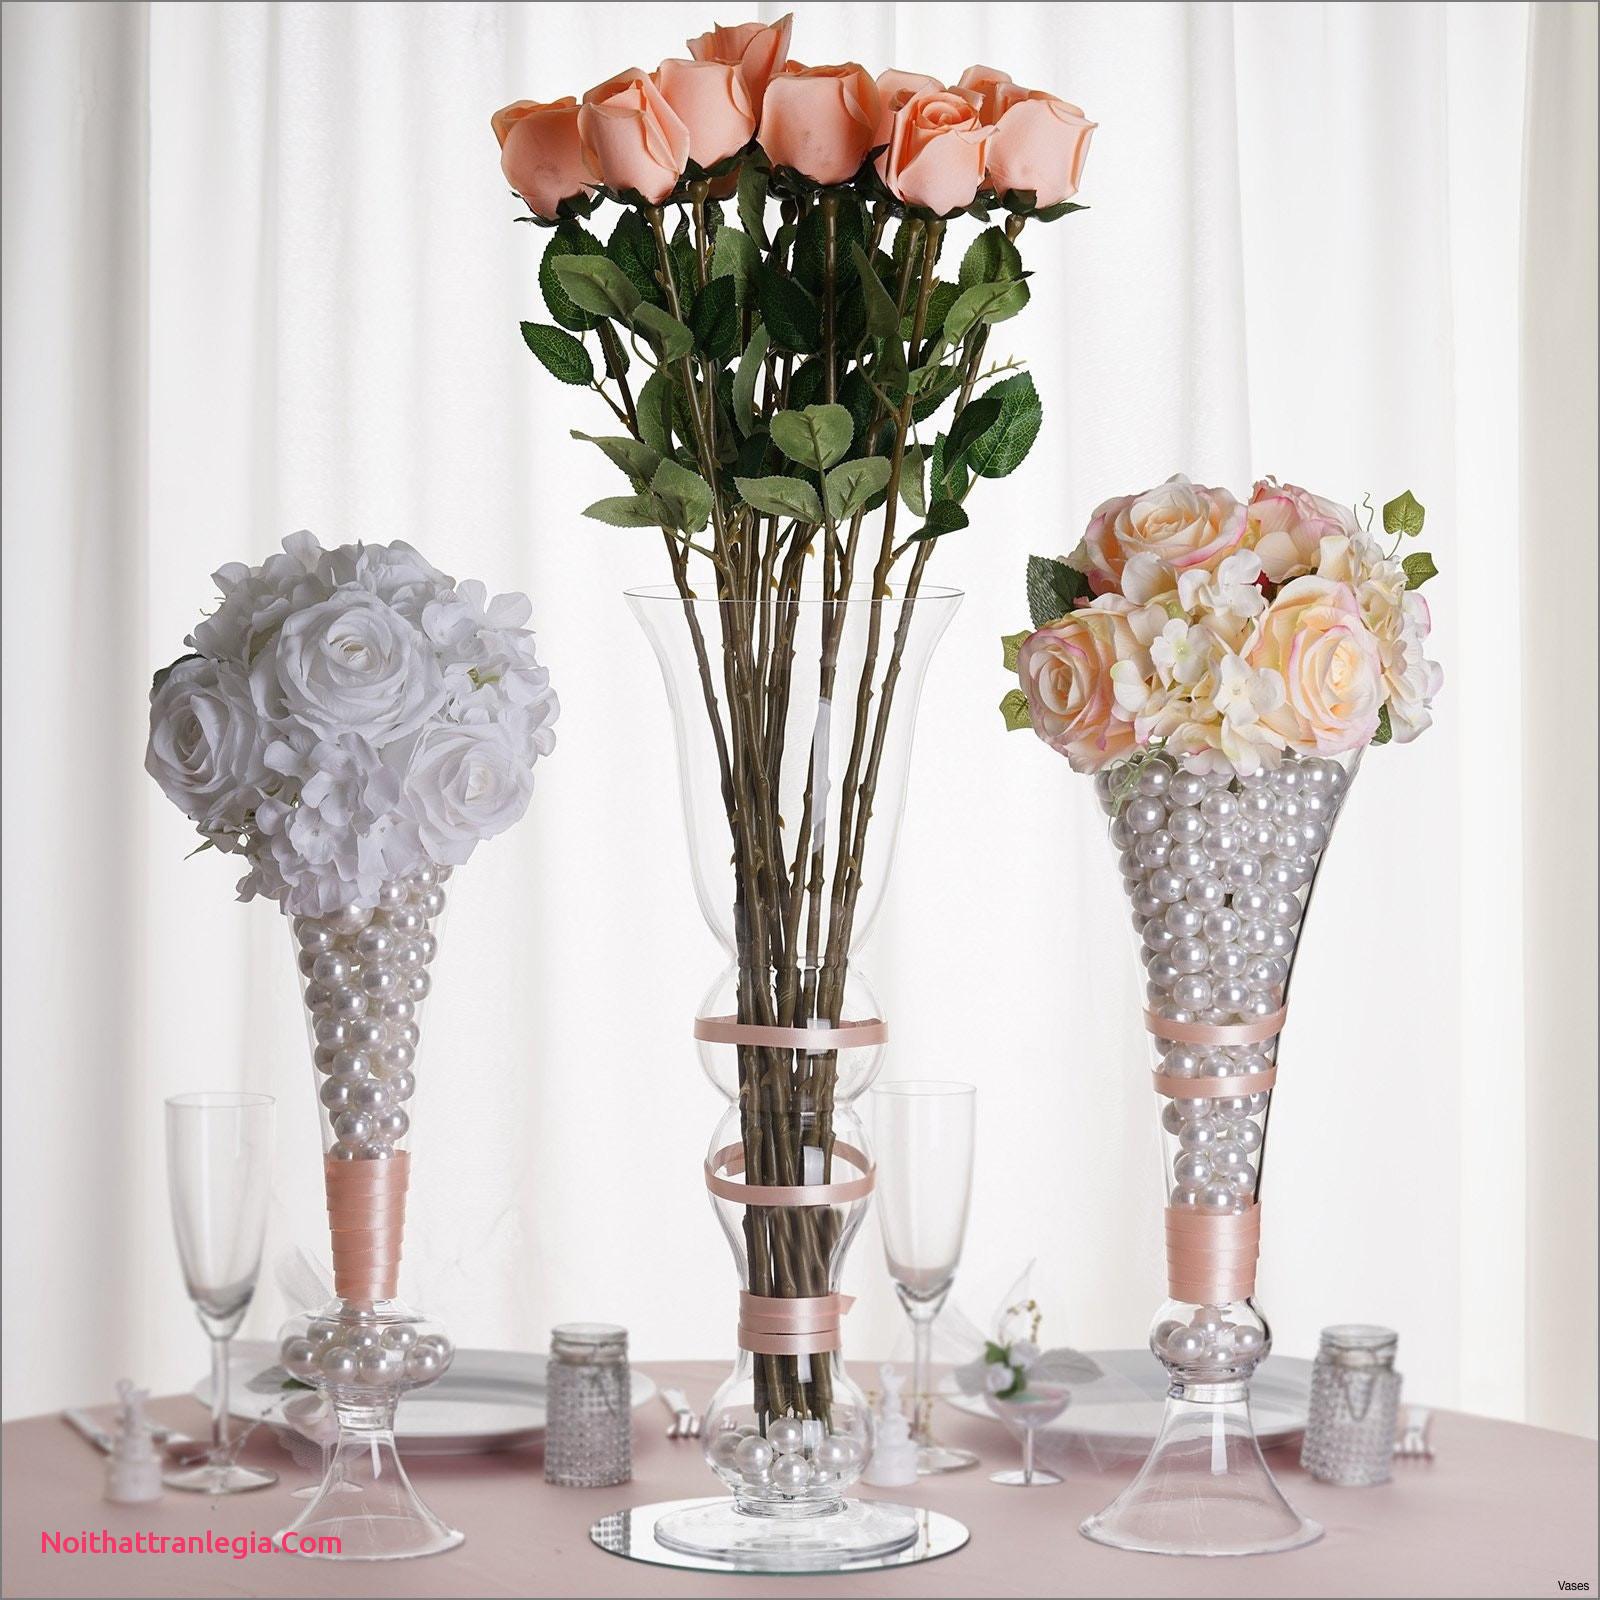 decorative vase set of 20 how to clean flower vases noithattranlegia vases design pertaining to update clipart awesome flower vase table 04h vases tablei 0d clipart dining base end design